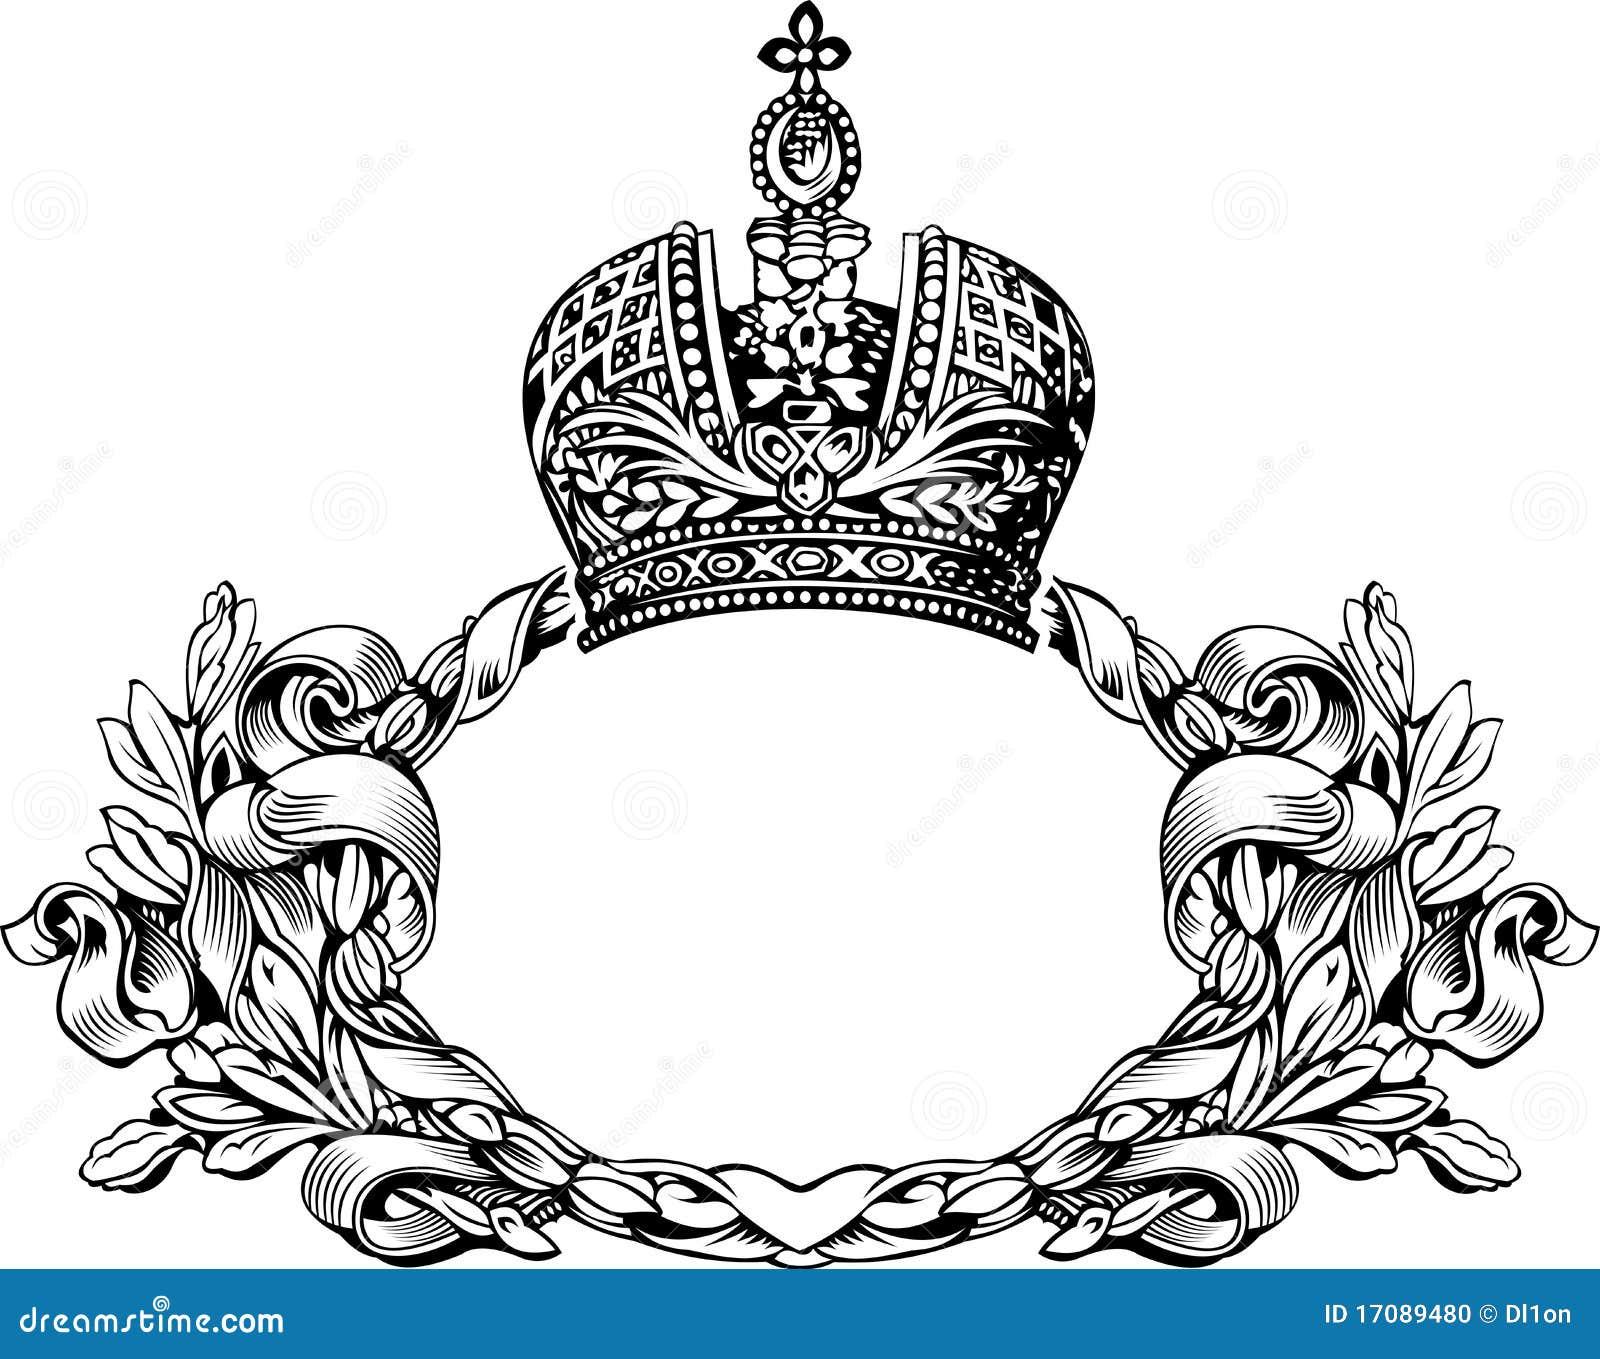 one color royal crown vintage banner stock image image 23376821